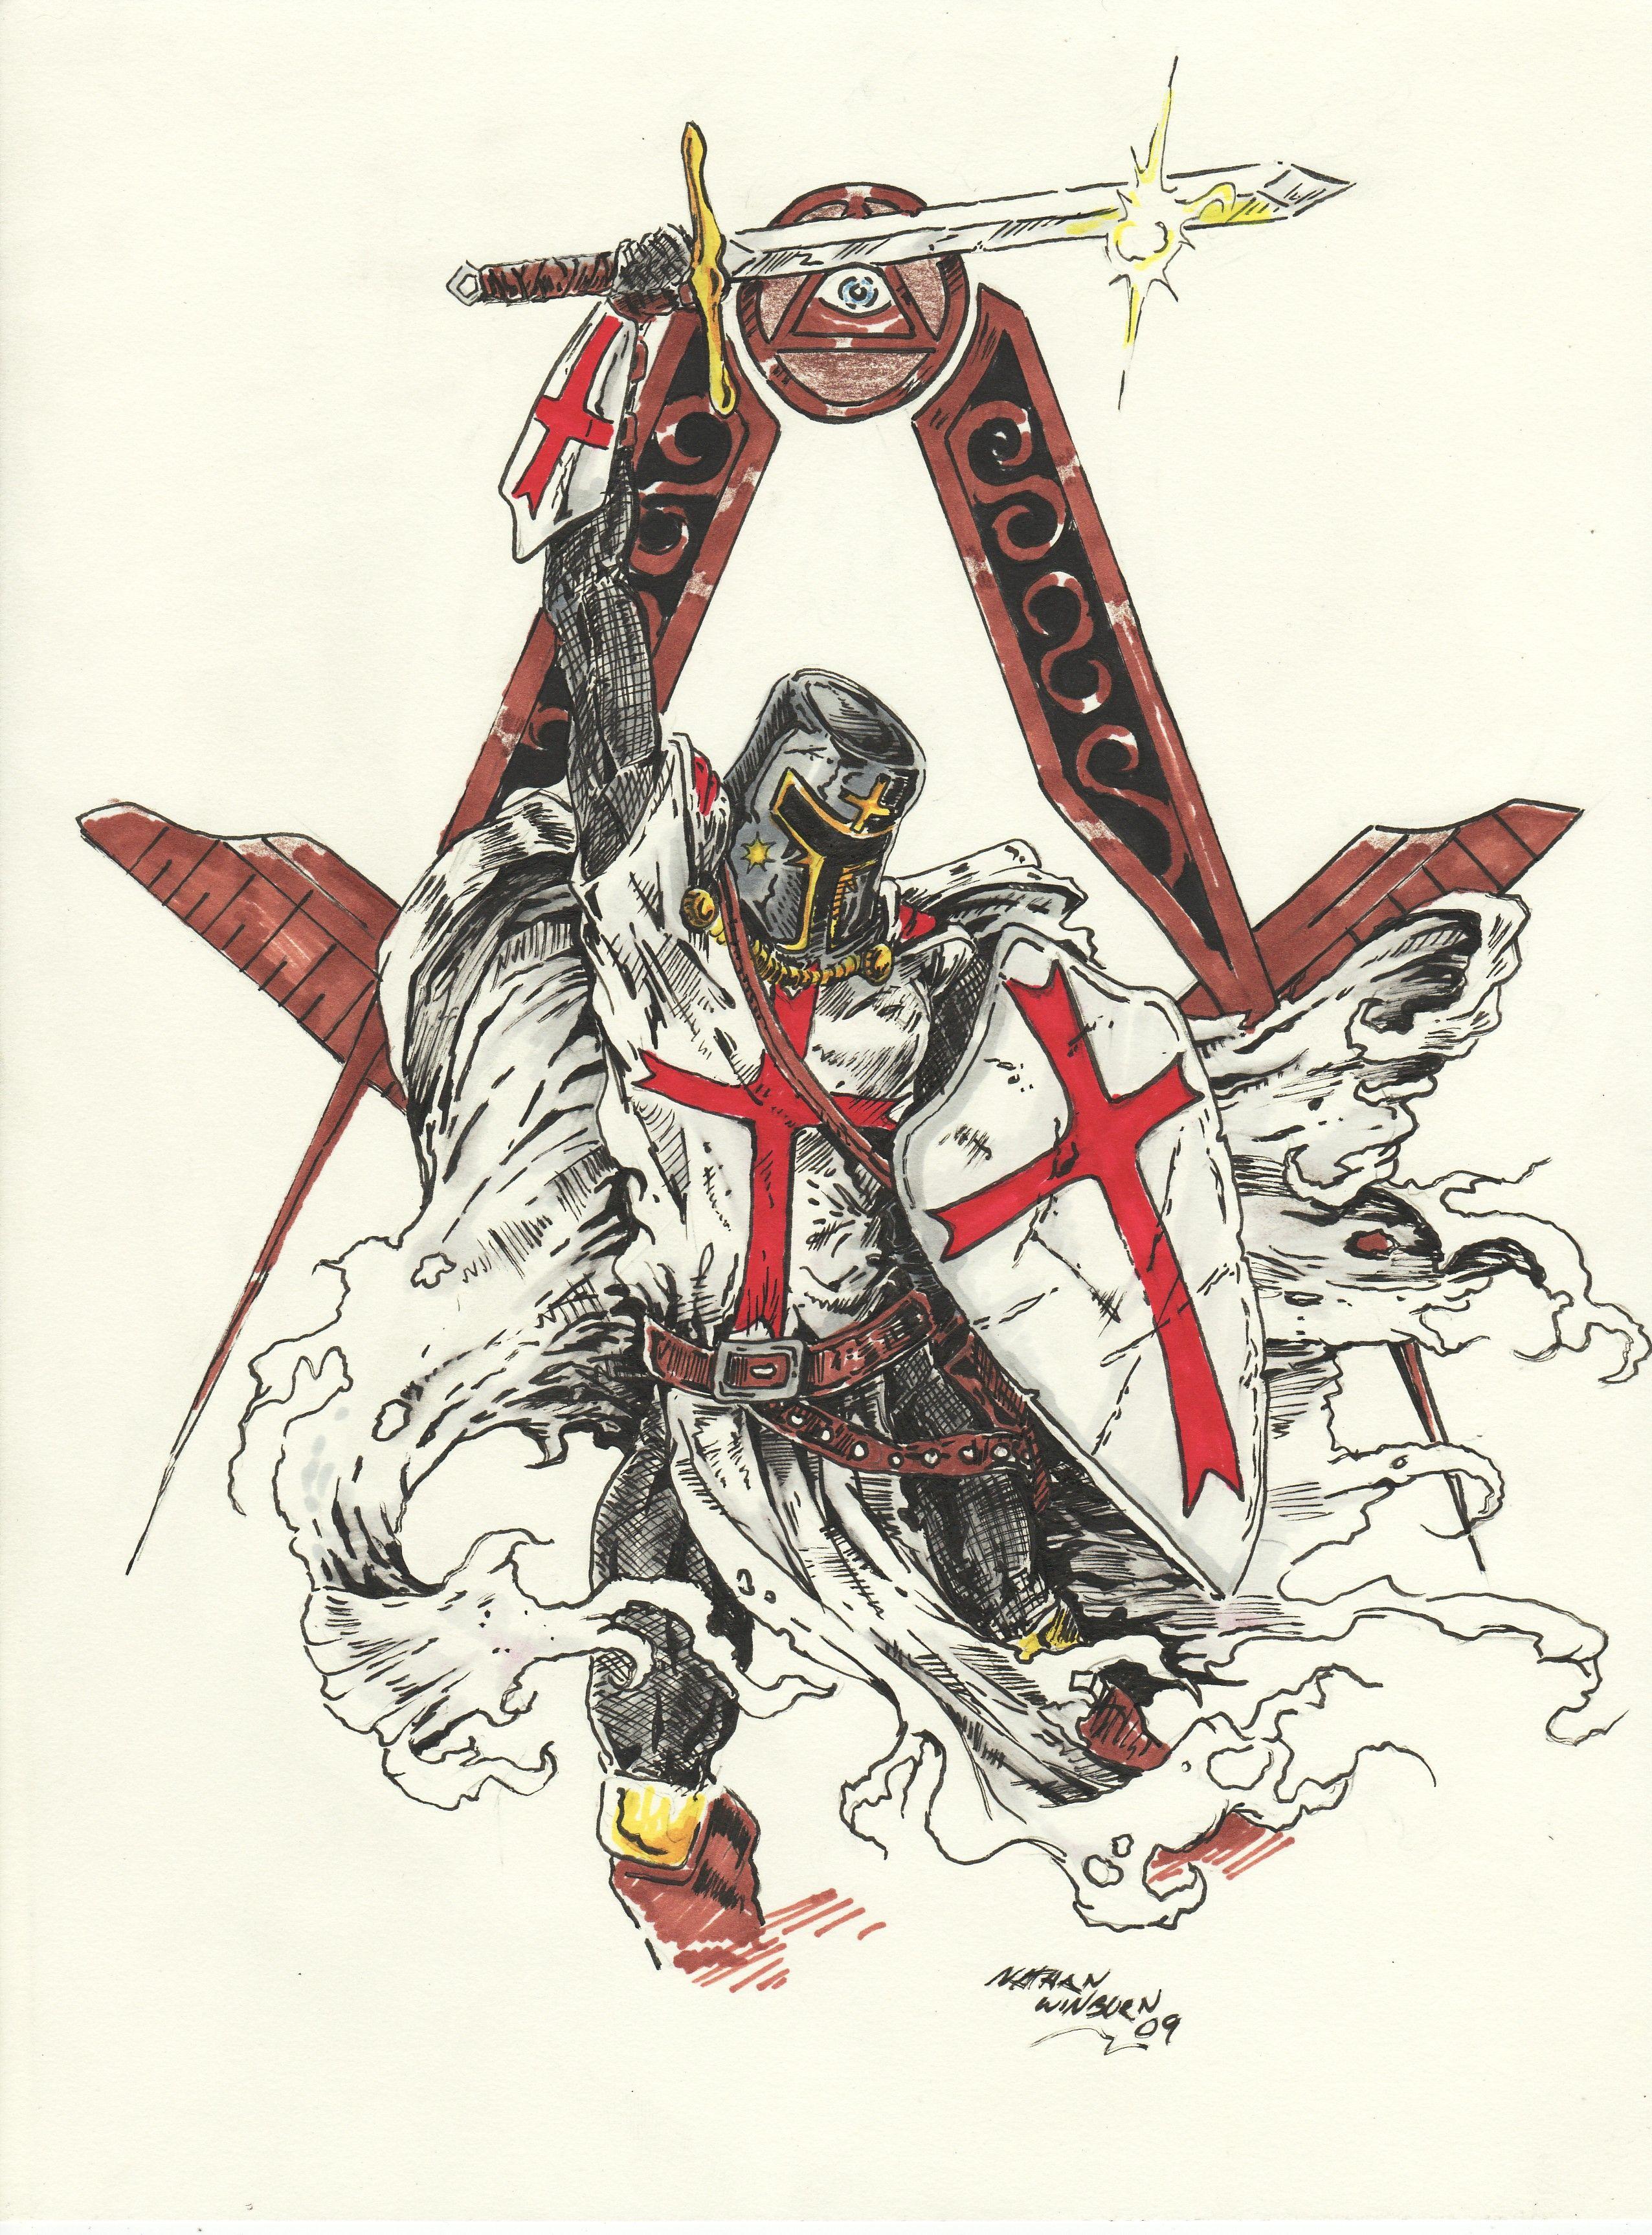 Freemason Tattoo Knights Templar The Key To All Things That Is